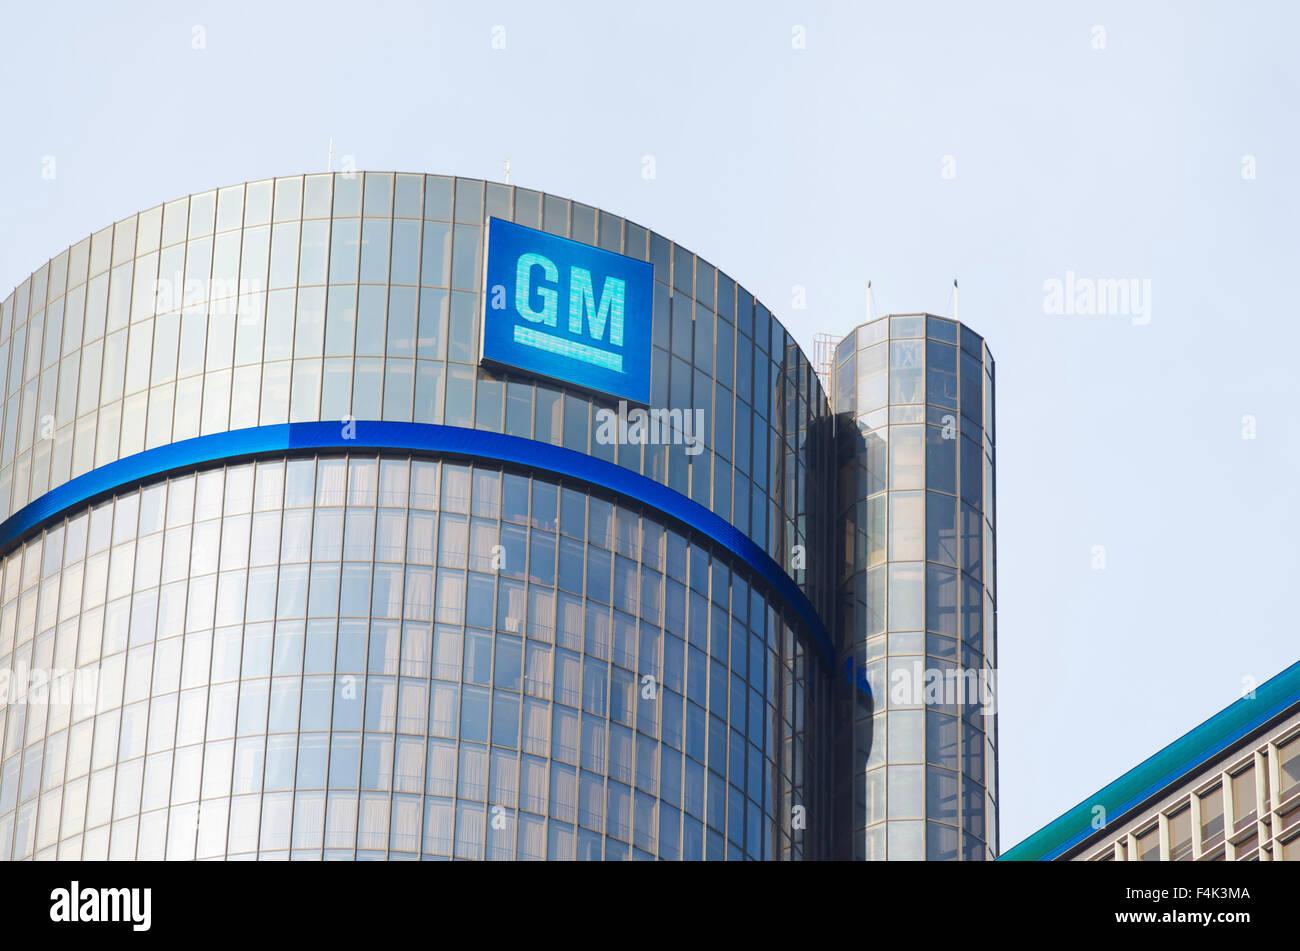 GM Headquarter Building in Detroit - Stock Image